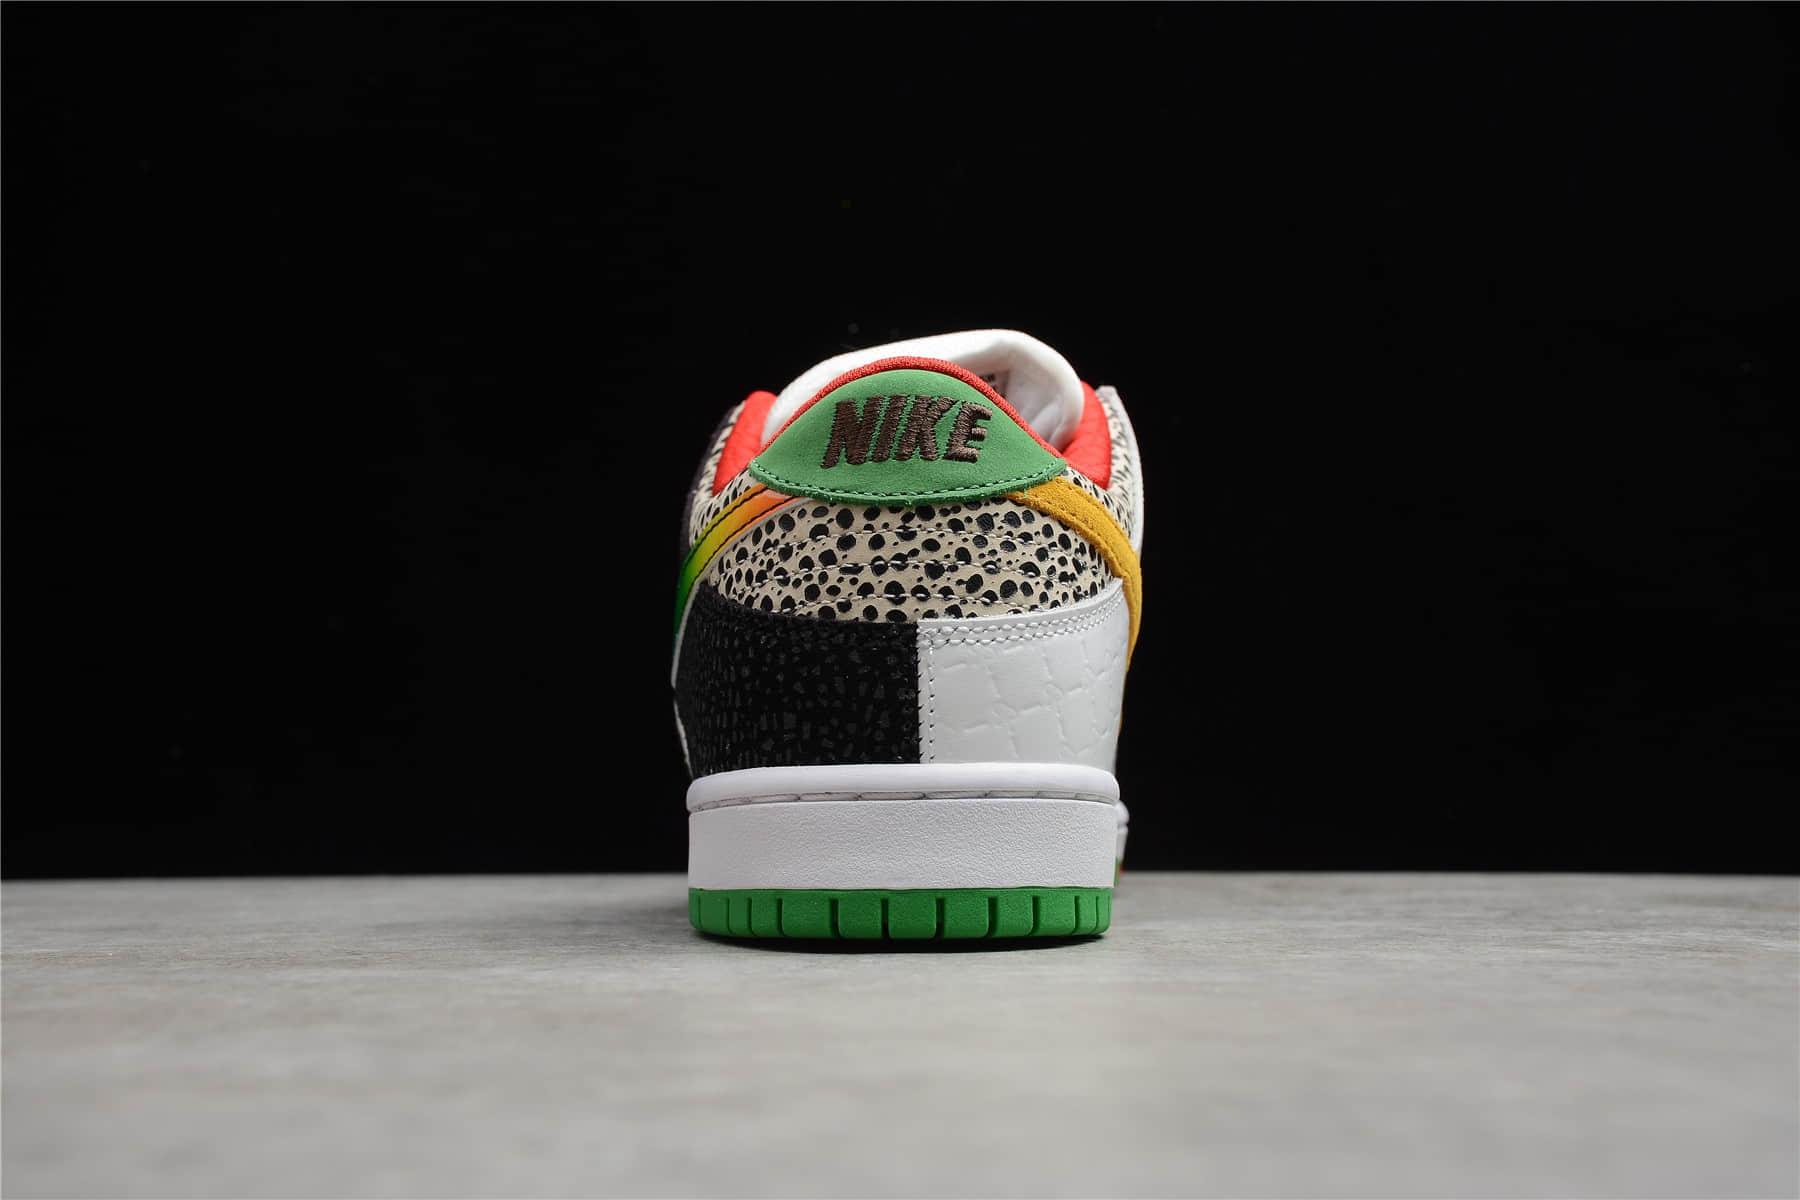 "耐克SB Dunk彩色拼接 Nike SB Dunk Low Pro QS ""What The P-Rod""Releases Tomorrow 耐克Dunk鸳鸯低帮板鞋 货号:CZ2239-600-潮流者之家"